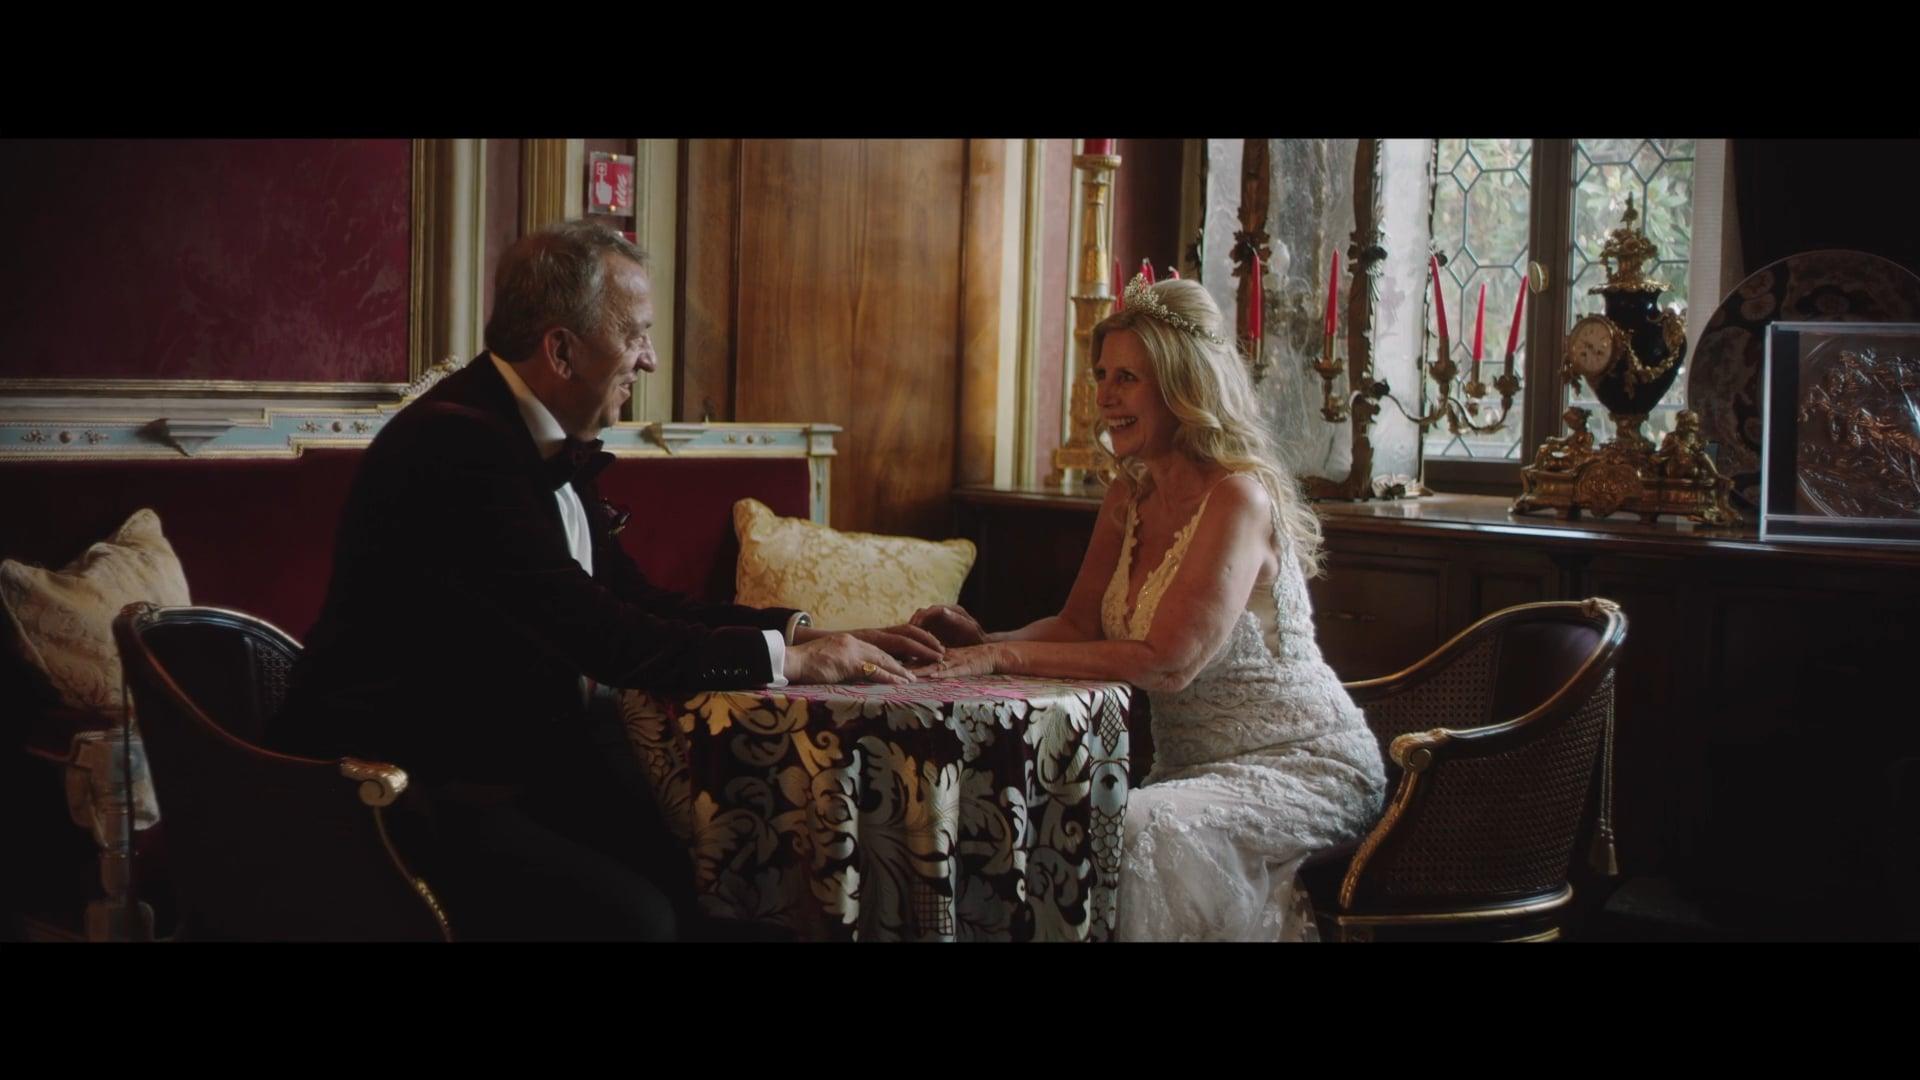 WEDDING FILM - Mandy and Andrew